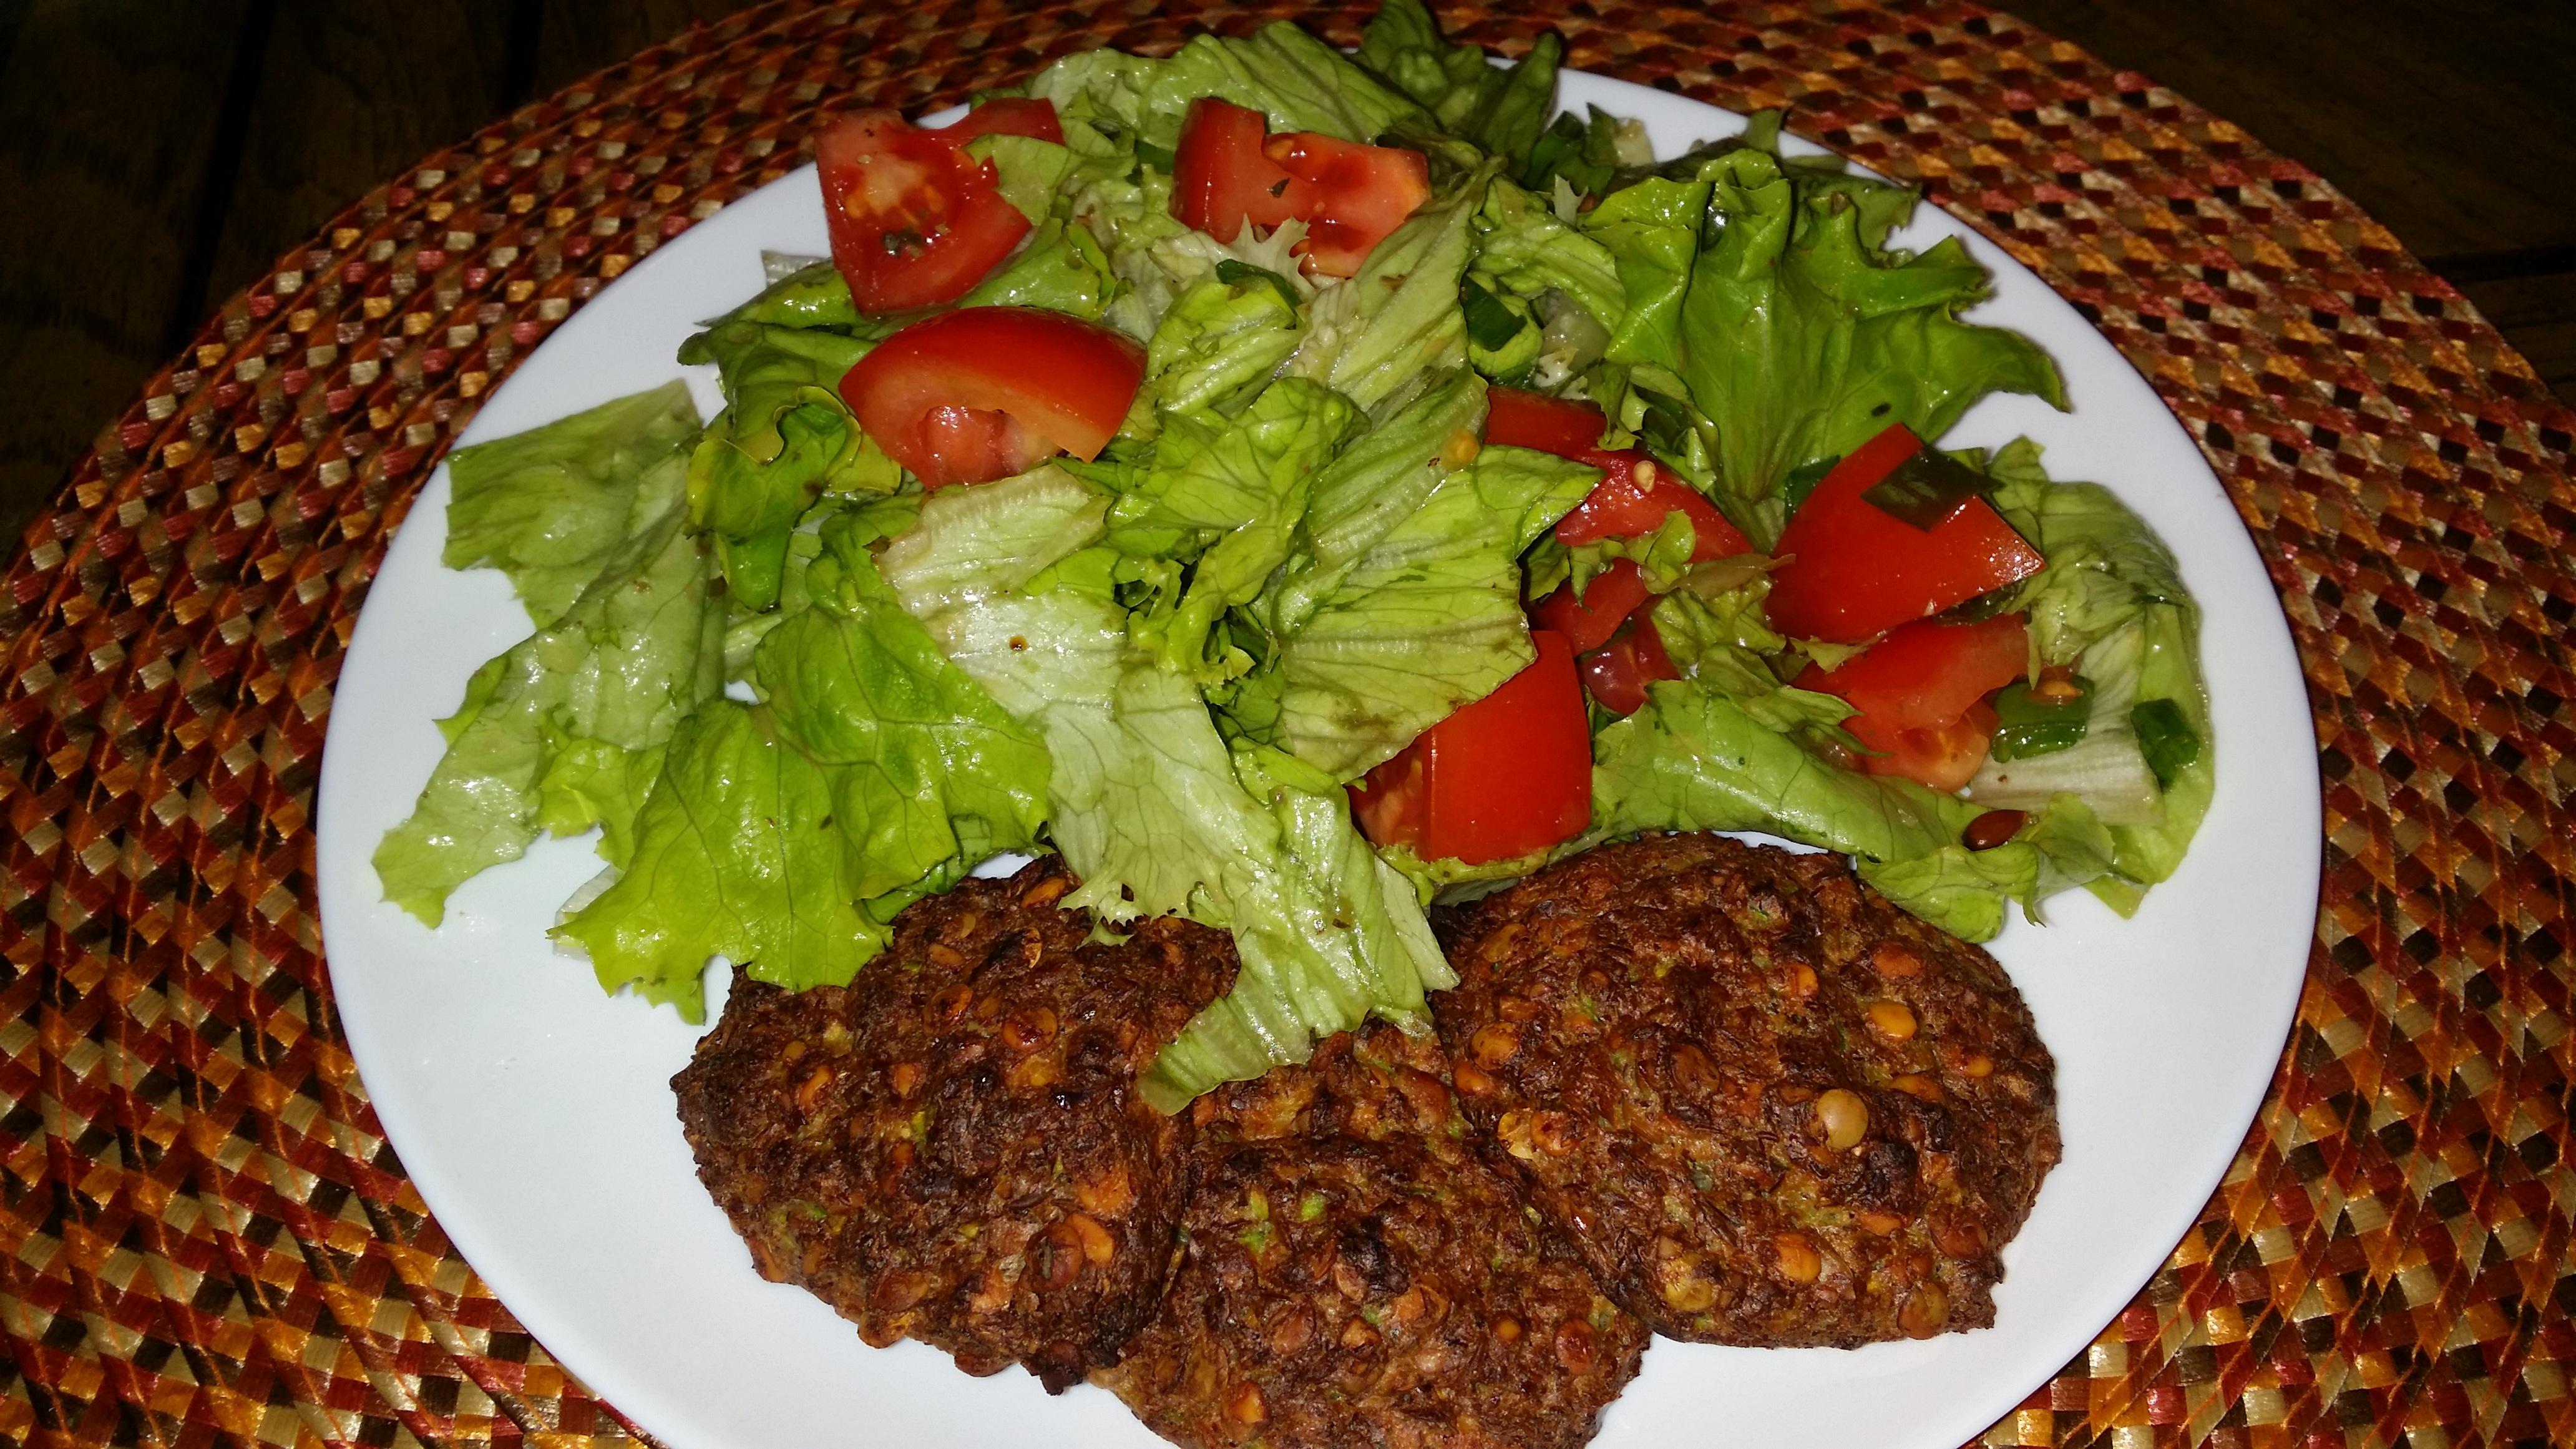 Fotos gratis : plato ensalada Produce vegetal Fresco